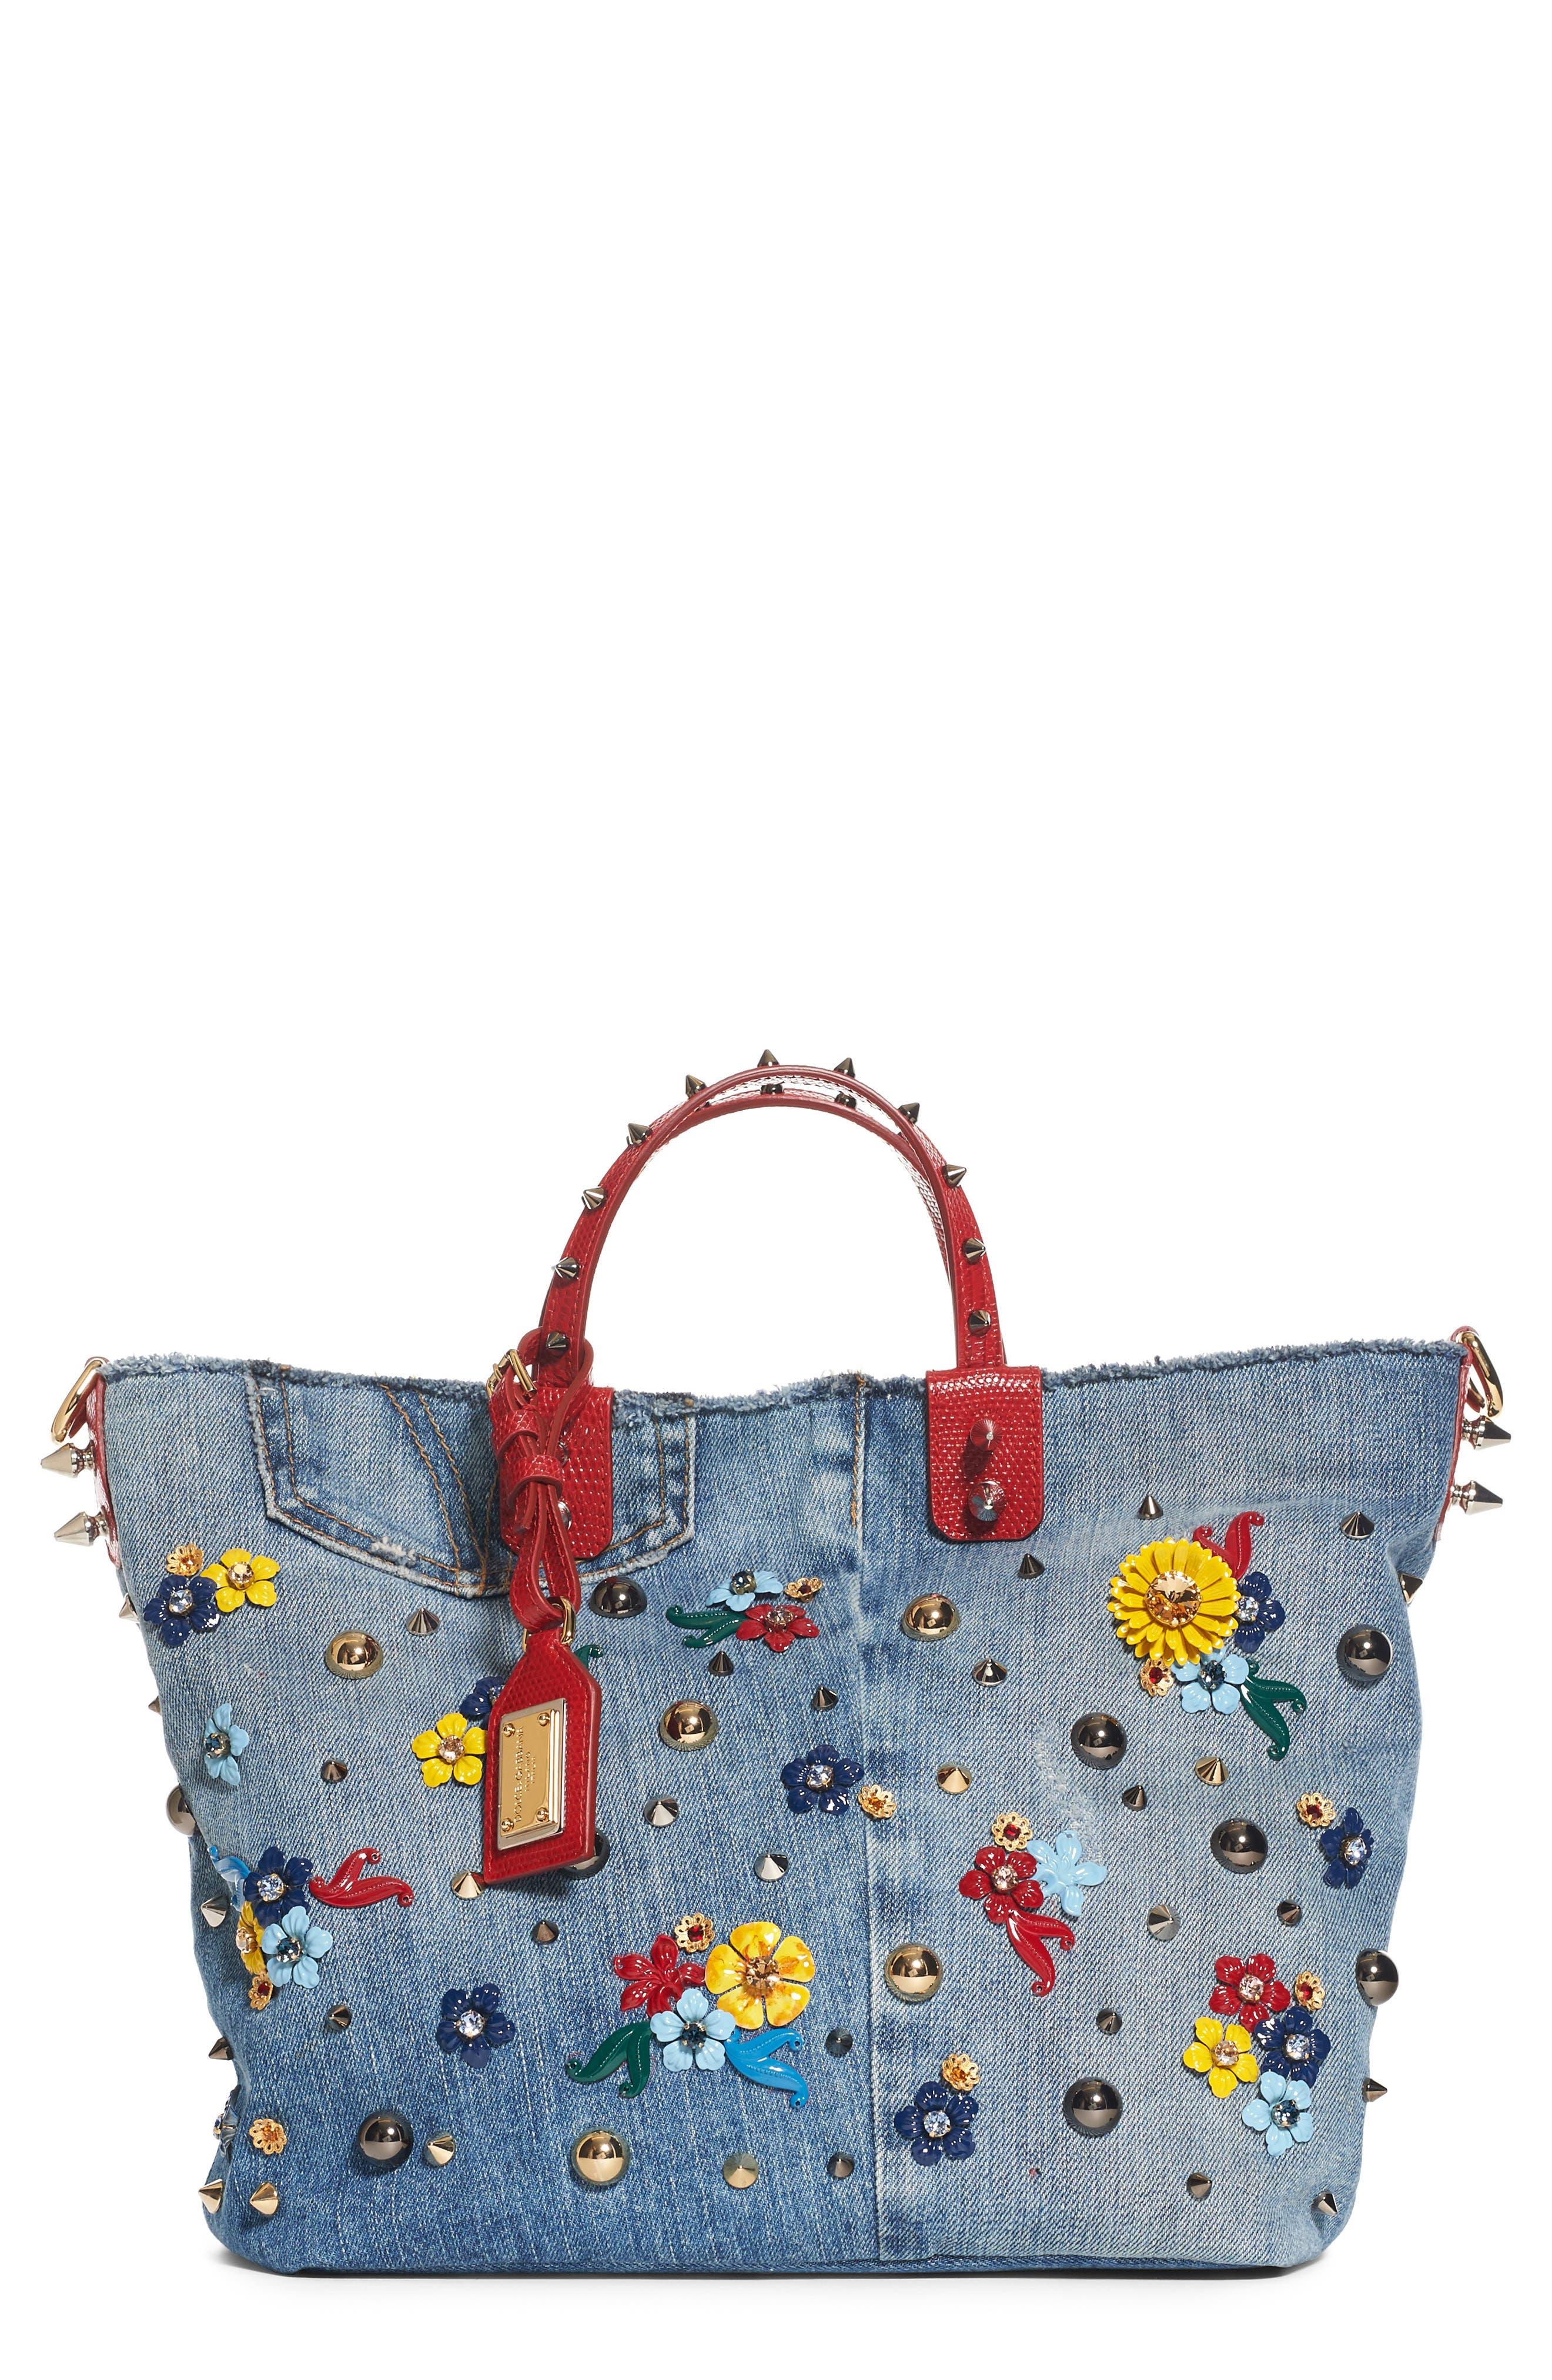 Main Image - Dolce&Gabbana Small Embellished Denim Tote